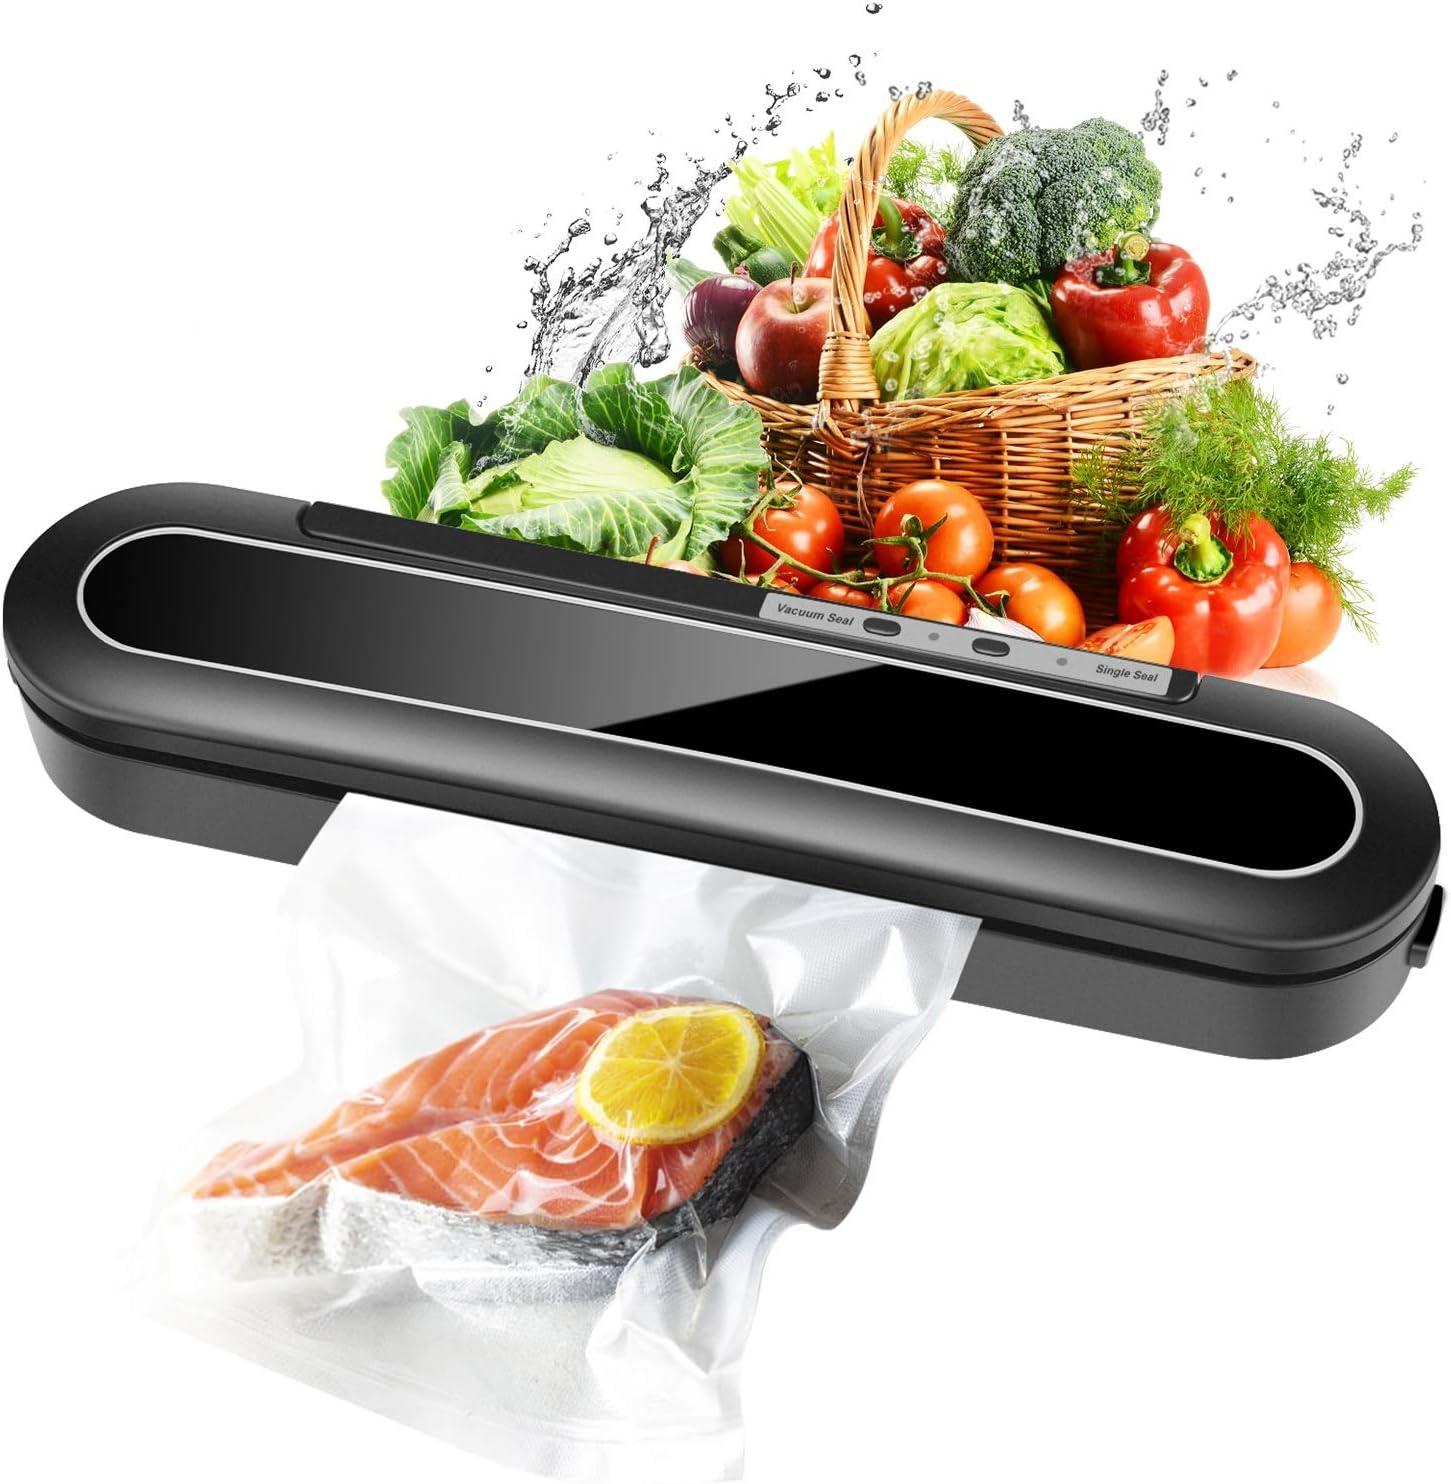 Vacuum Sealer Machine, Automatic Food Sealer for Food Savers w/Starter Kit, 10 Pcs Vacuum Bags, Automatic Vacuum Air Sealing System Led Indicator Lights, Dry & Moist Food Modes